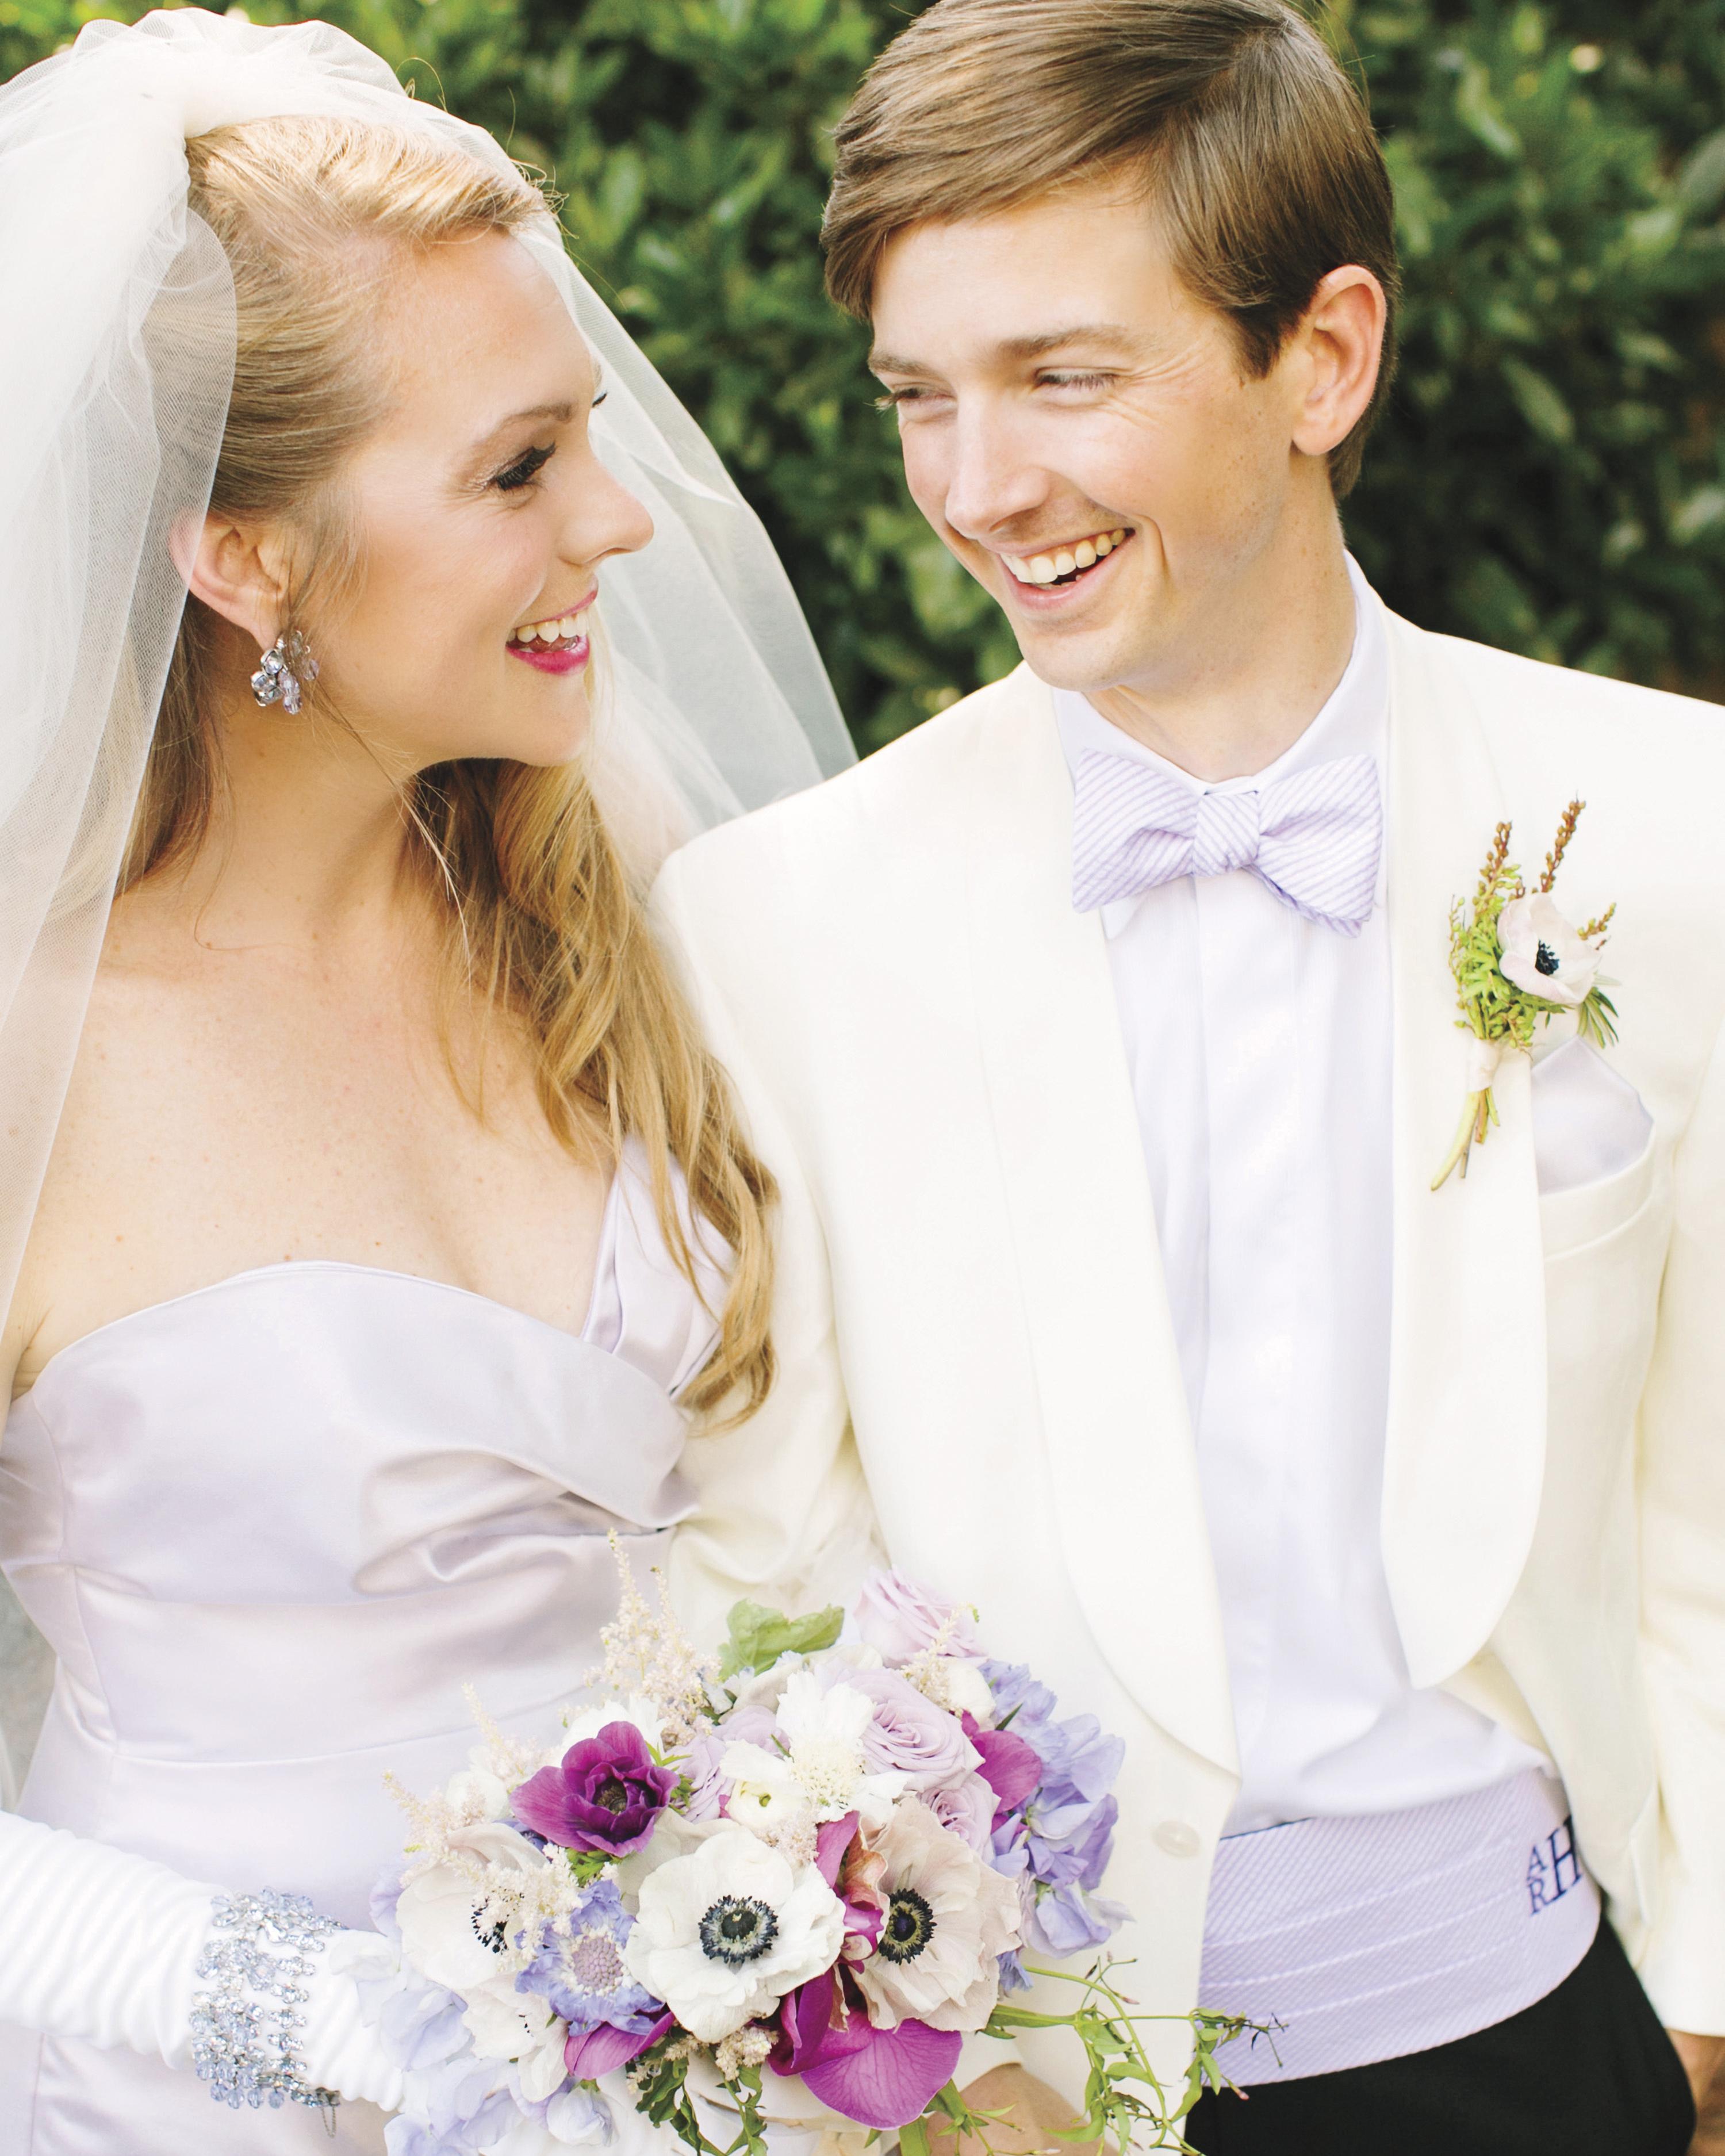 katelyn-austin-wedding-virgina-ka0349-s111979.jpg